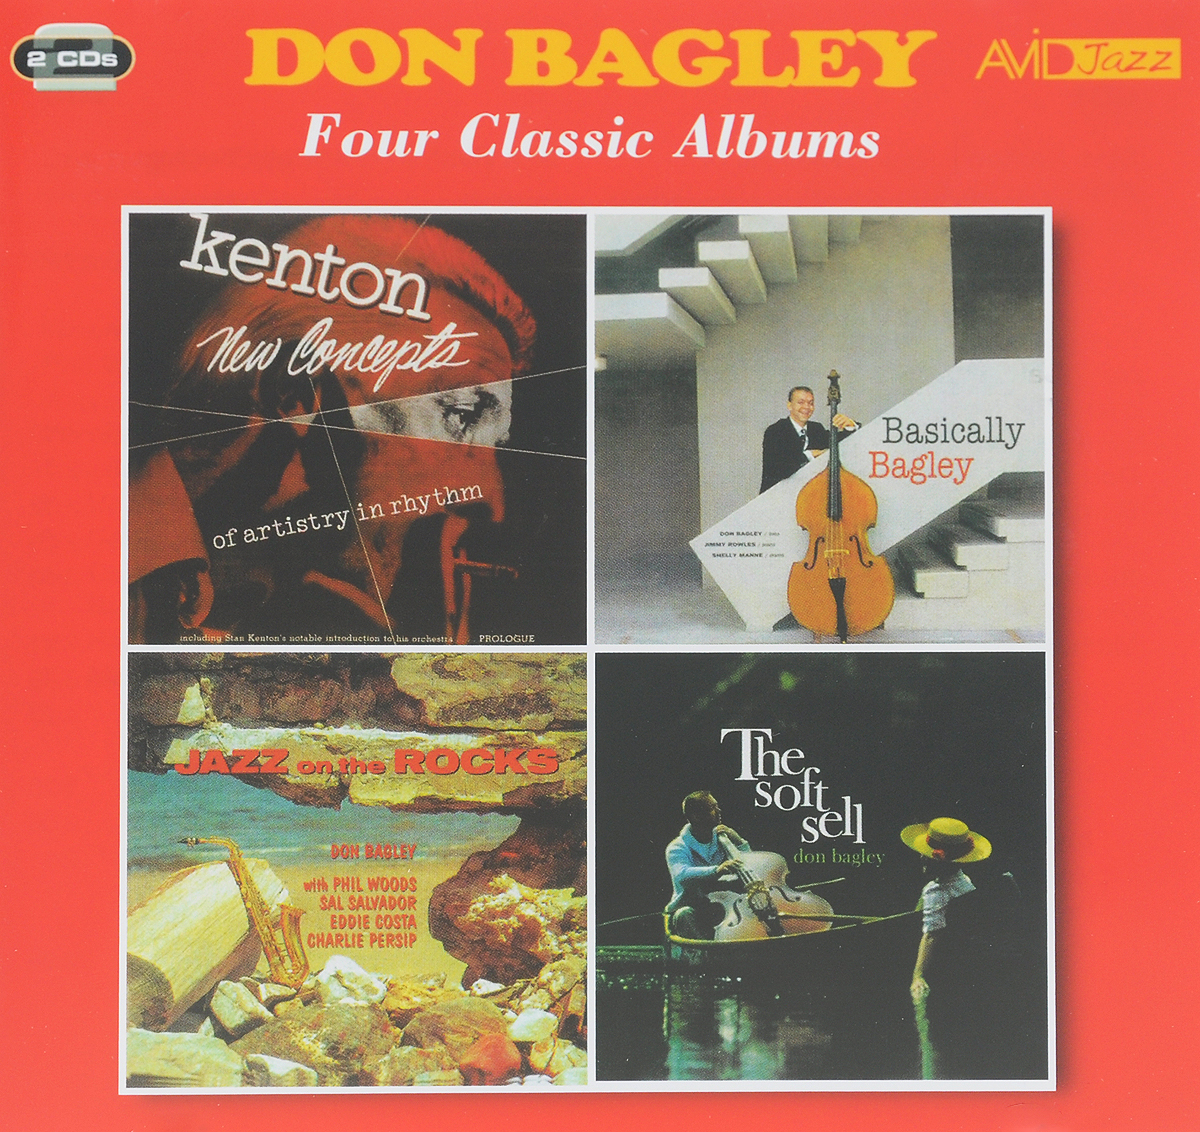 Дон Бэдли Don Bagley. Four Classic Albums (2 CD) уинтон келли avid jazz wynton kelly four classic albums 2 cd